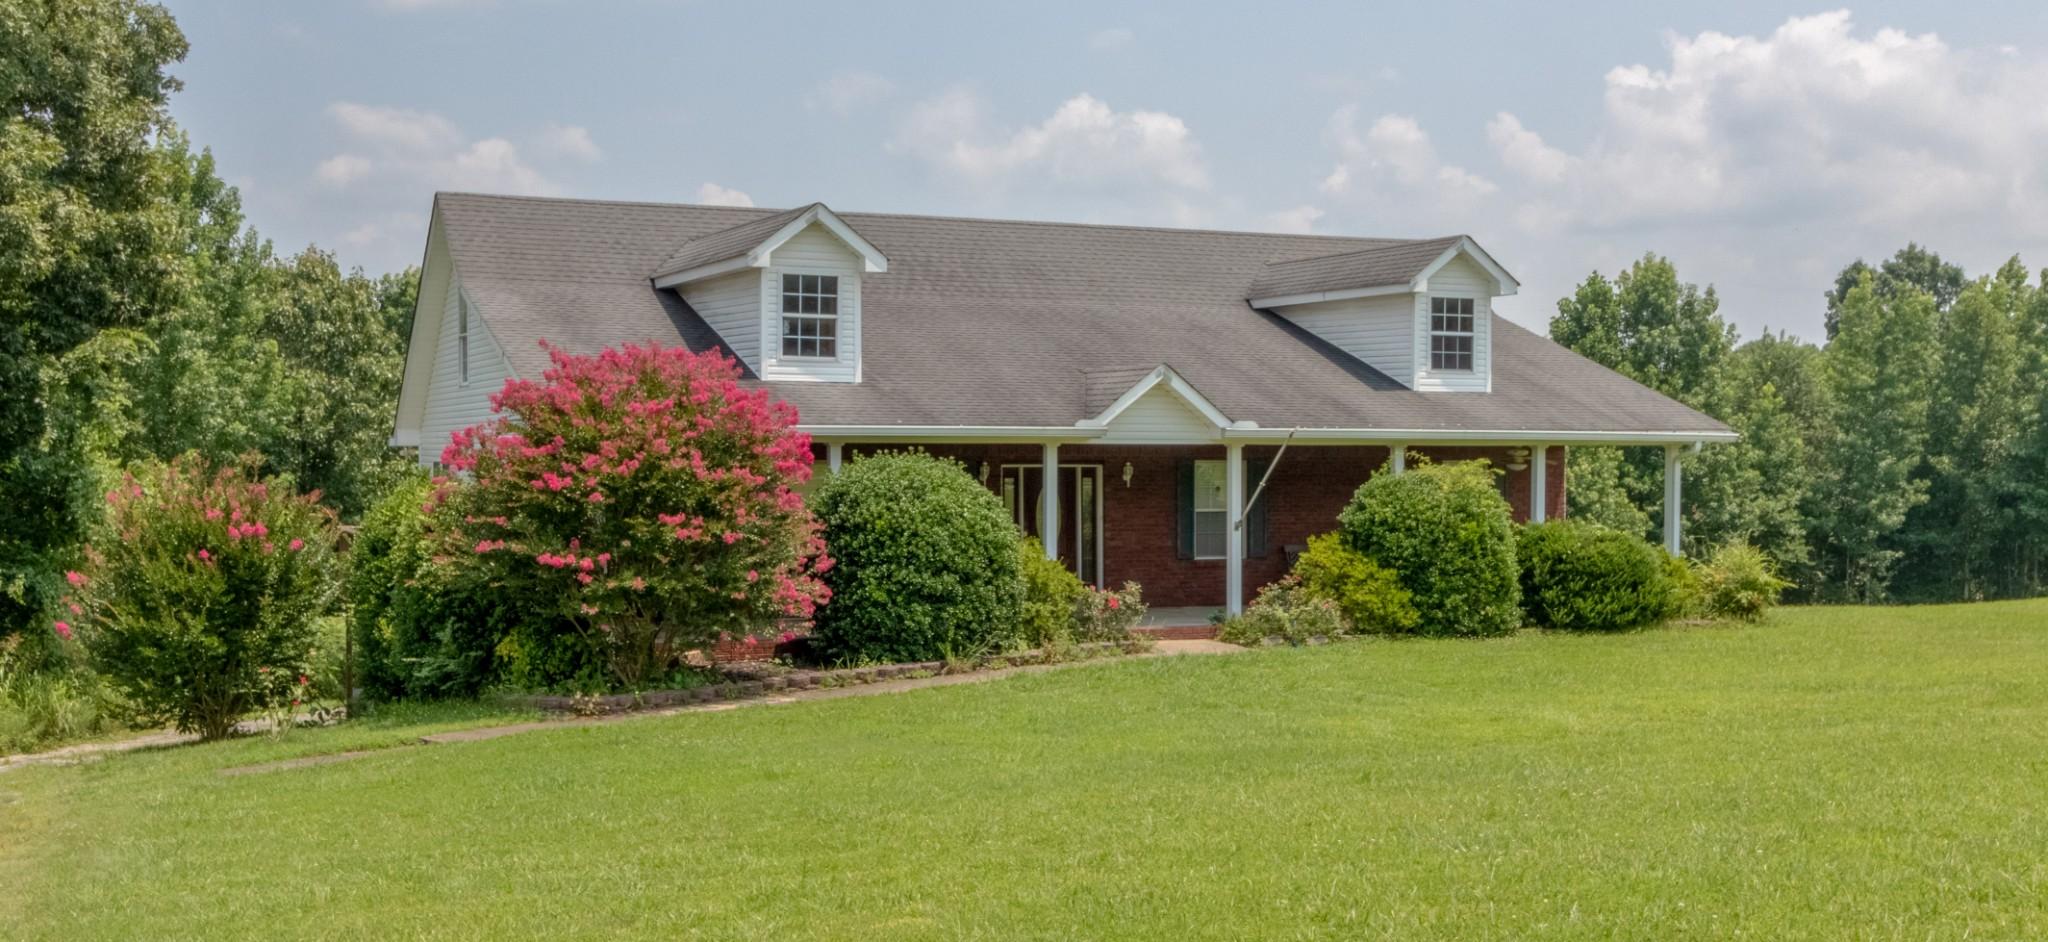 4669 Louise Creek Rd Property Photo